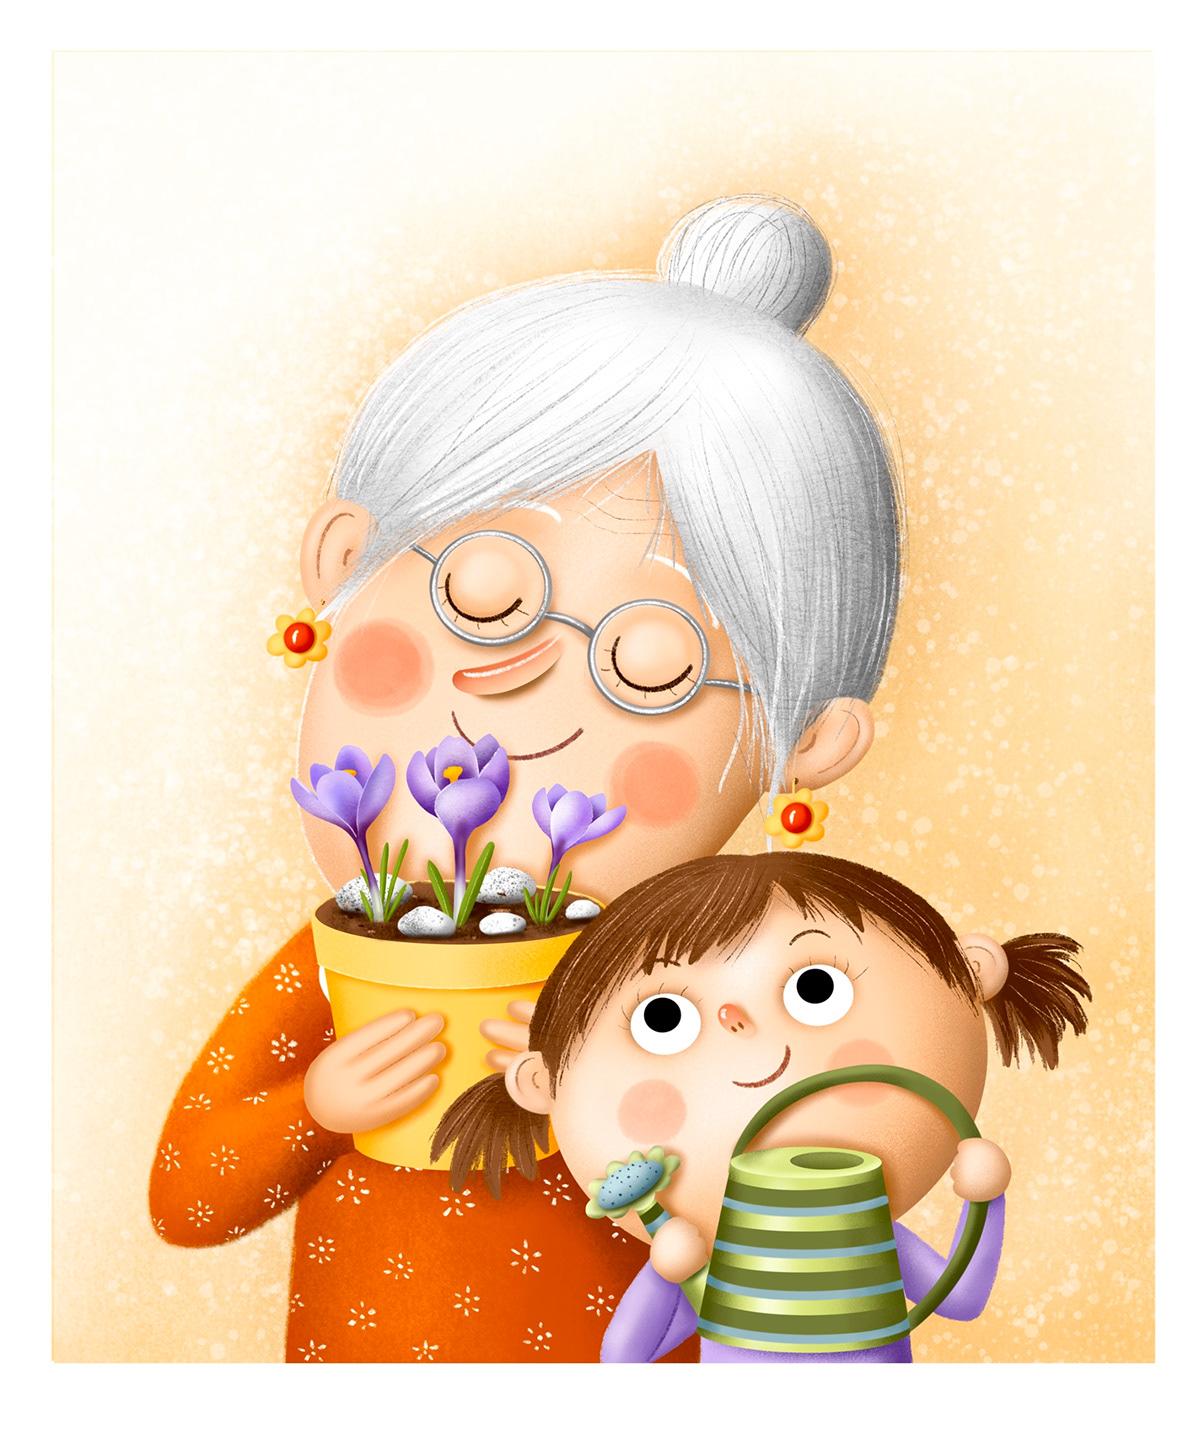 babicka book children Flowers grandmother ILLUSTRATION  spring